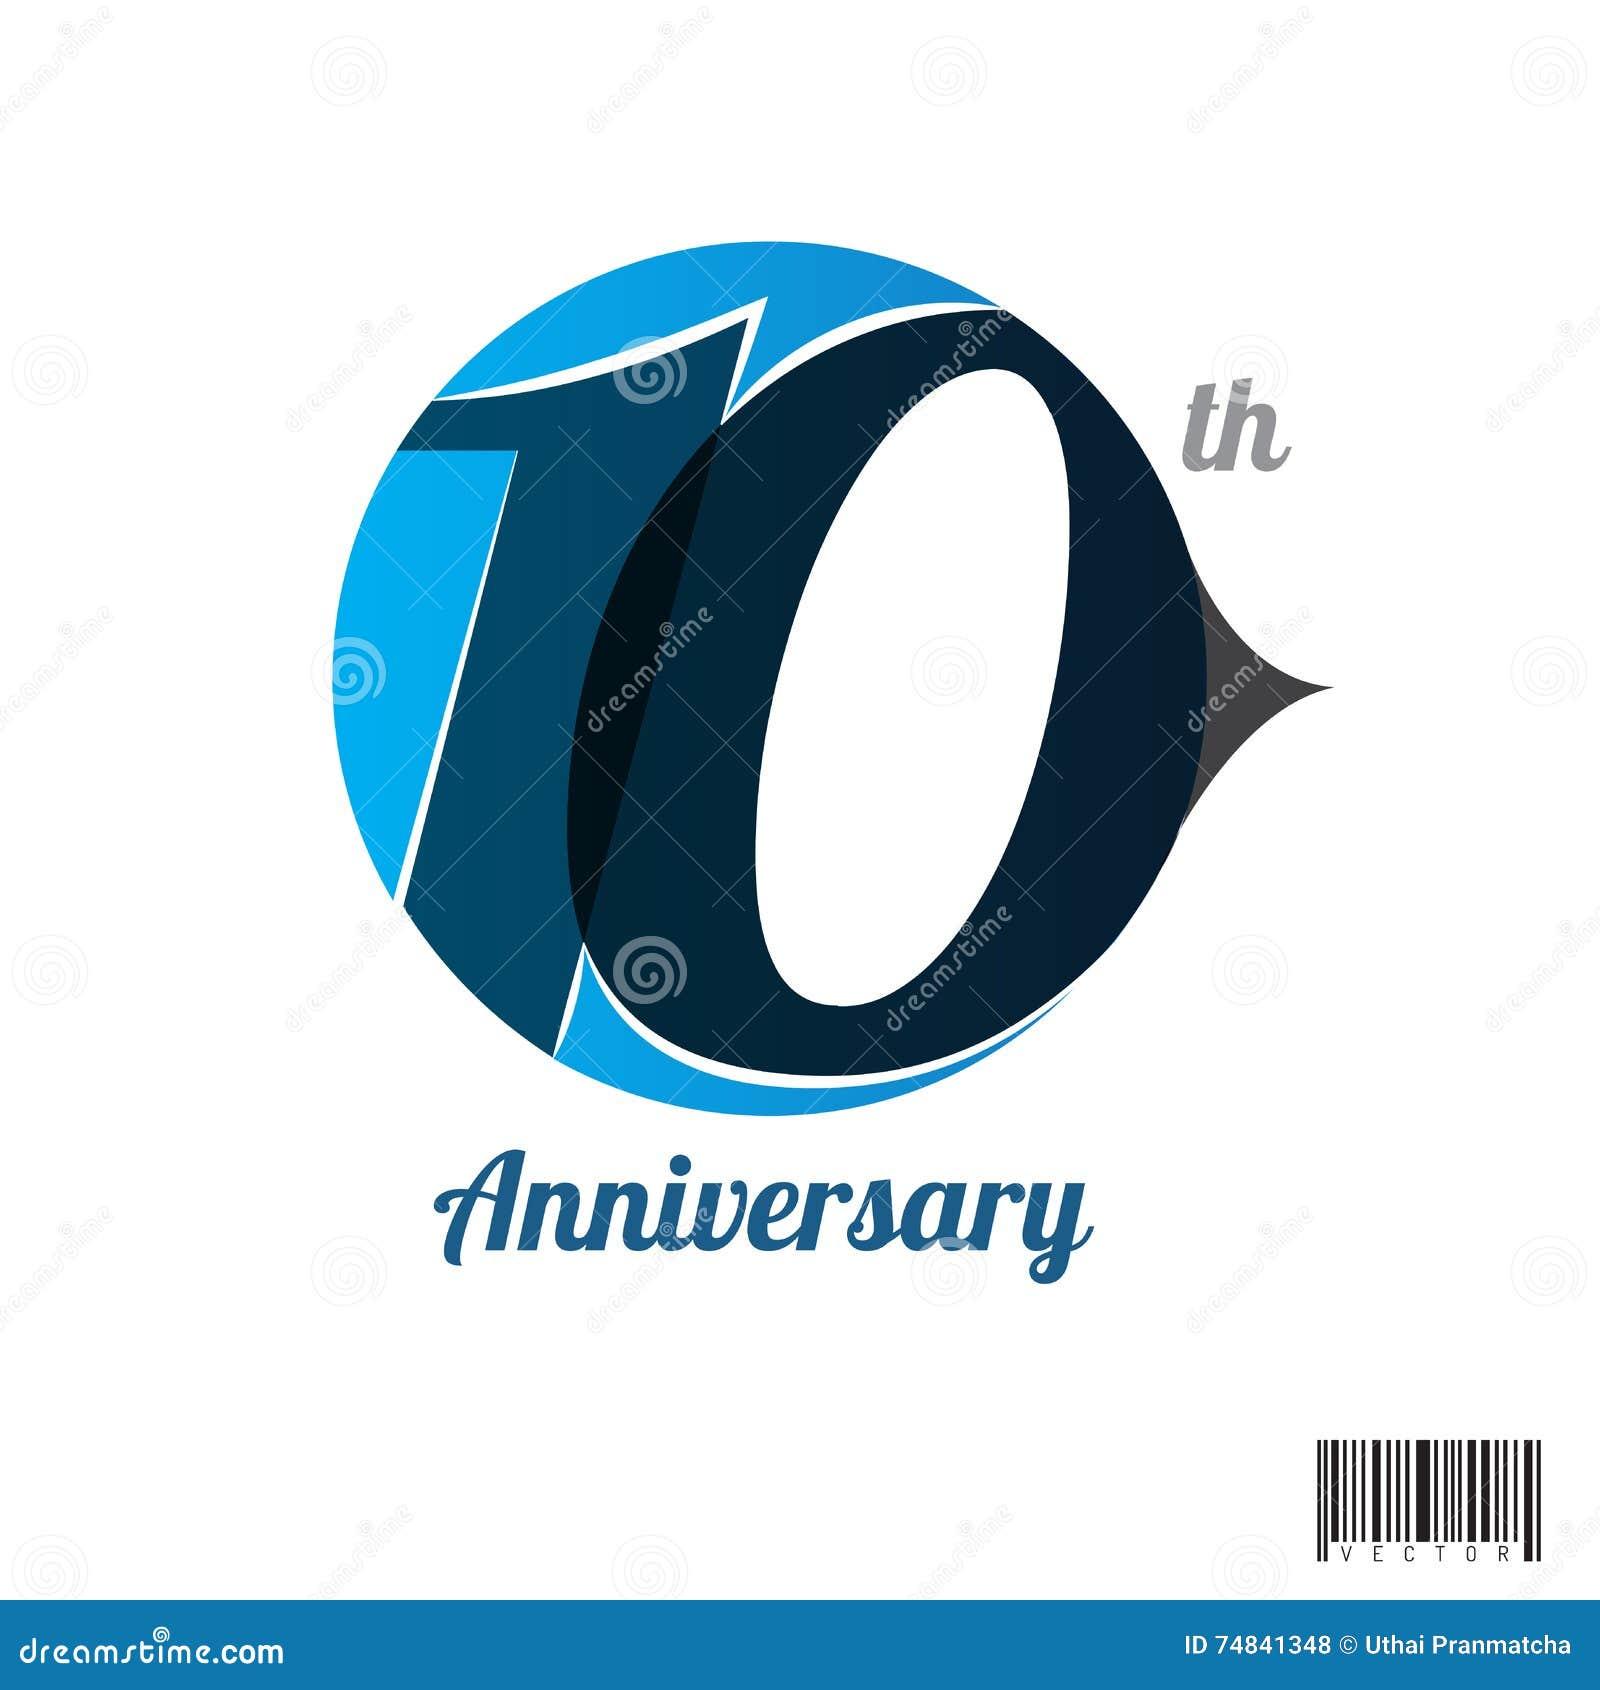 anniversary logo vector - photo #29